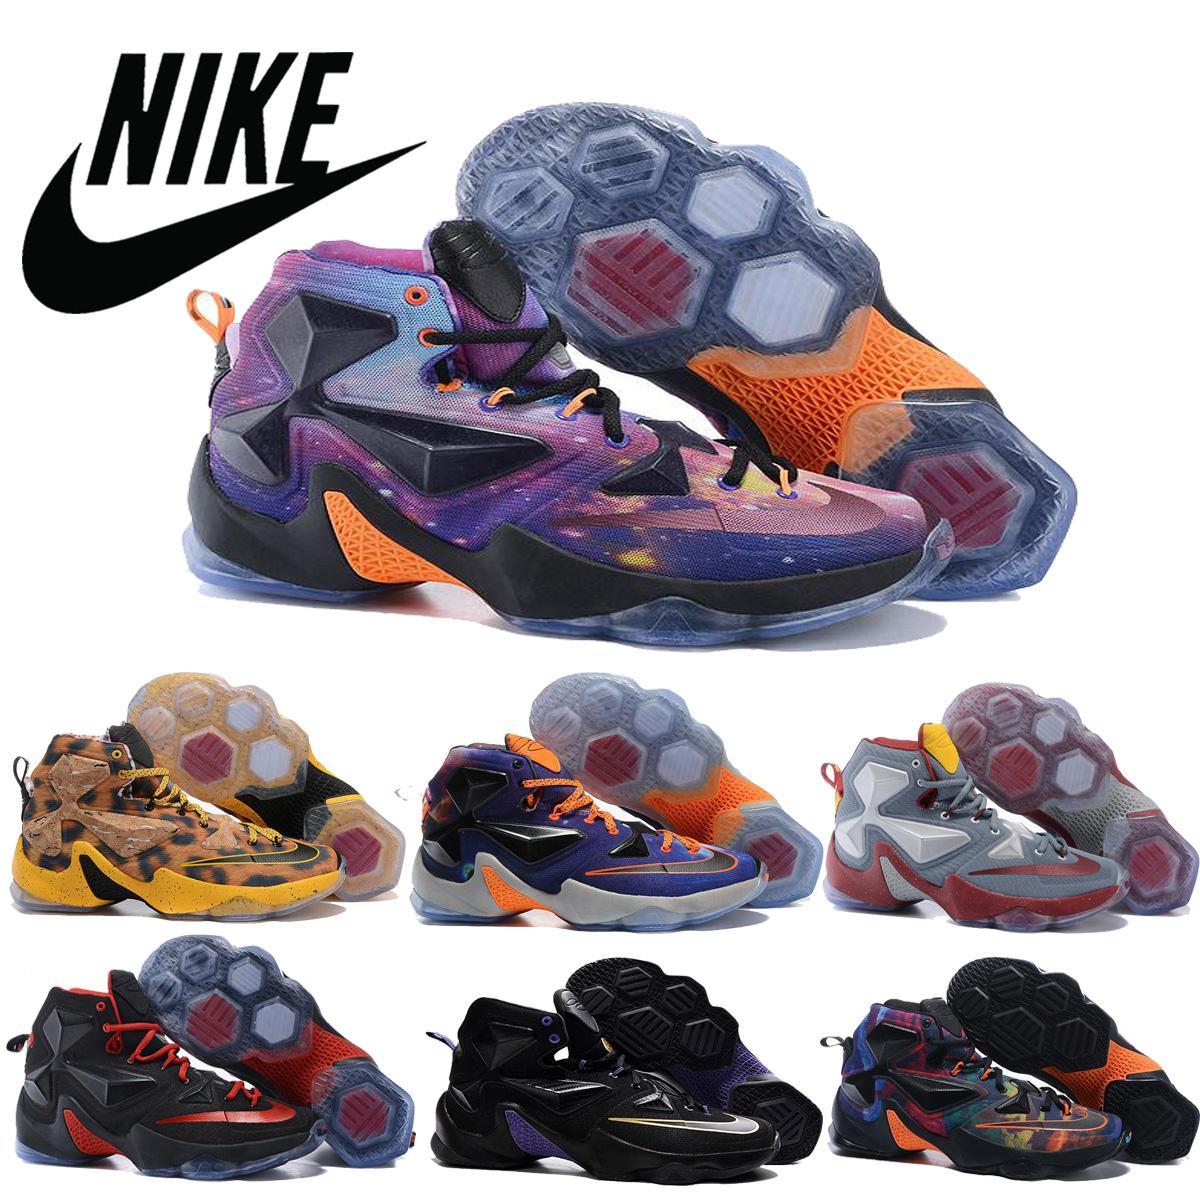 Lebron James Shoes 11 Galaxy